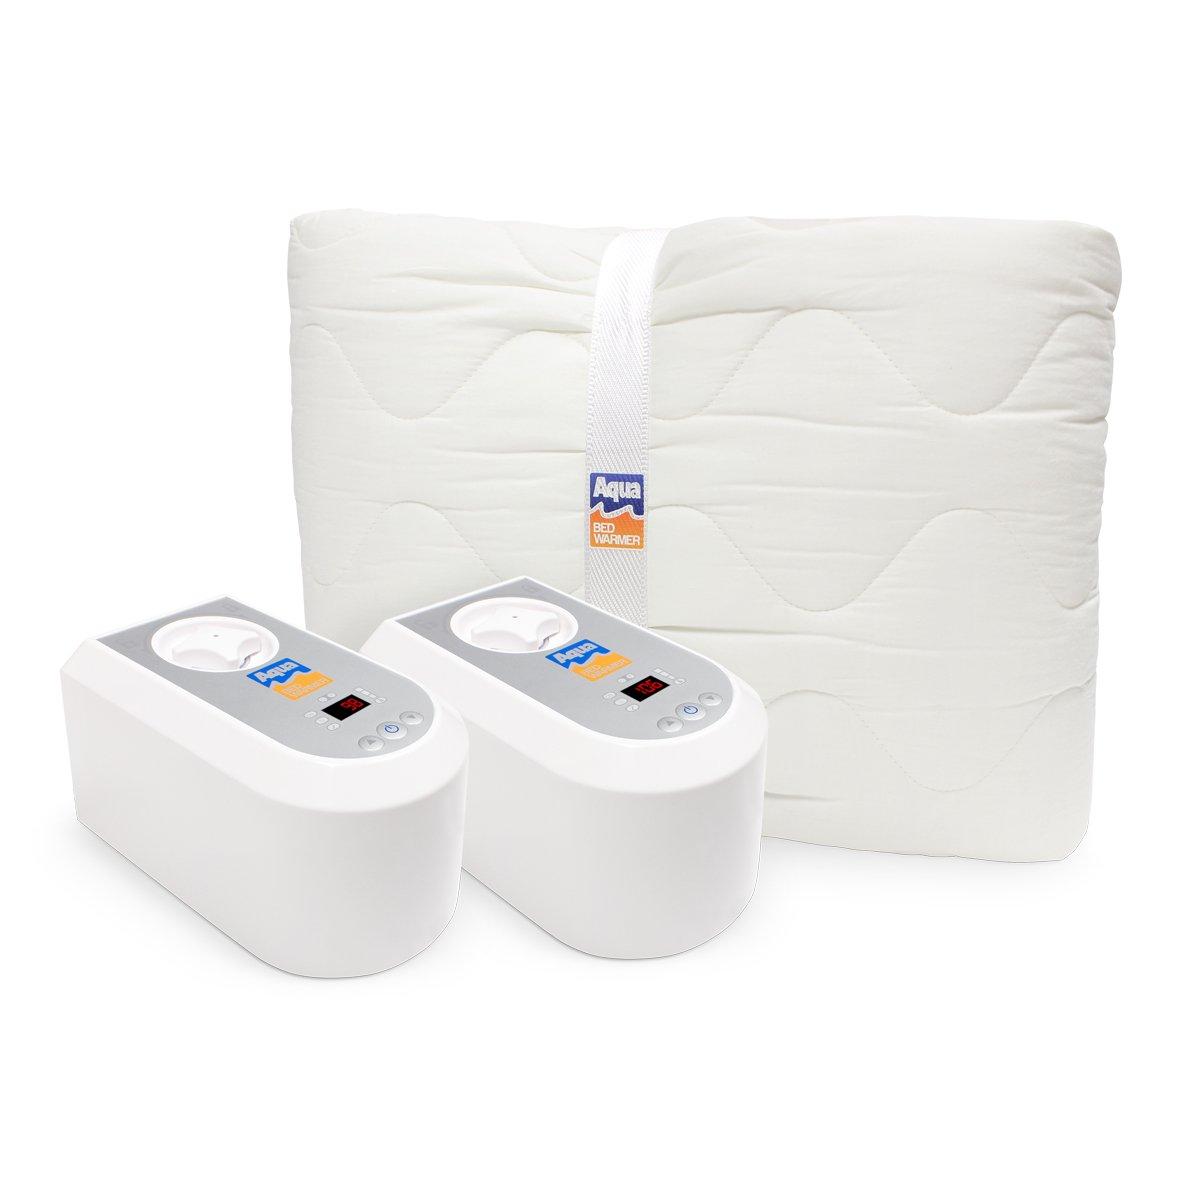 Aqua Bed Warmer Non-electric Heater Blanket (King Dual-Zone)